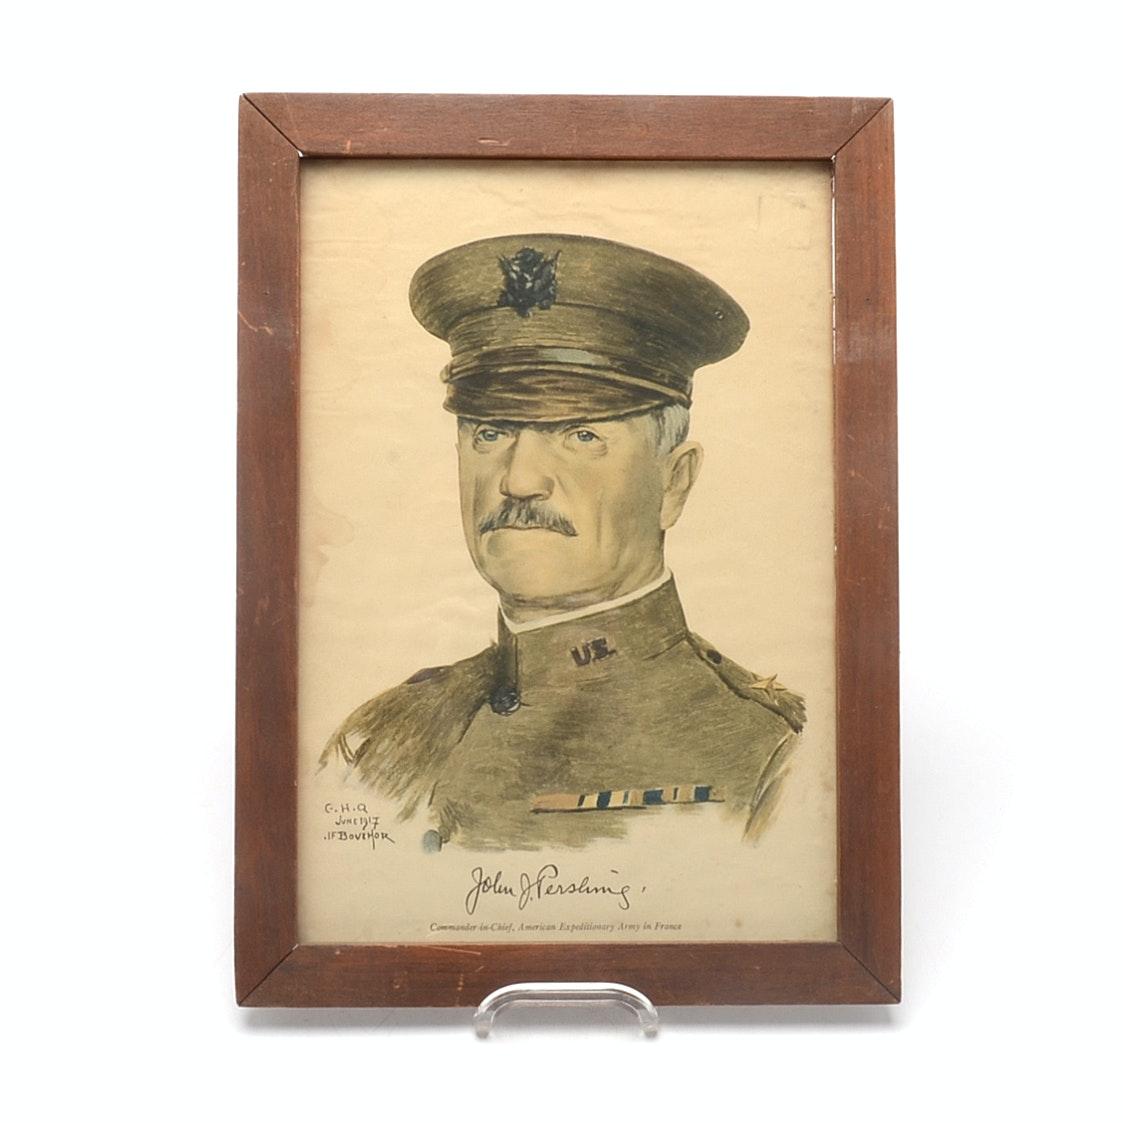 1917 General Pershing U.S. Army Framed Print